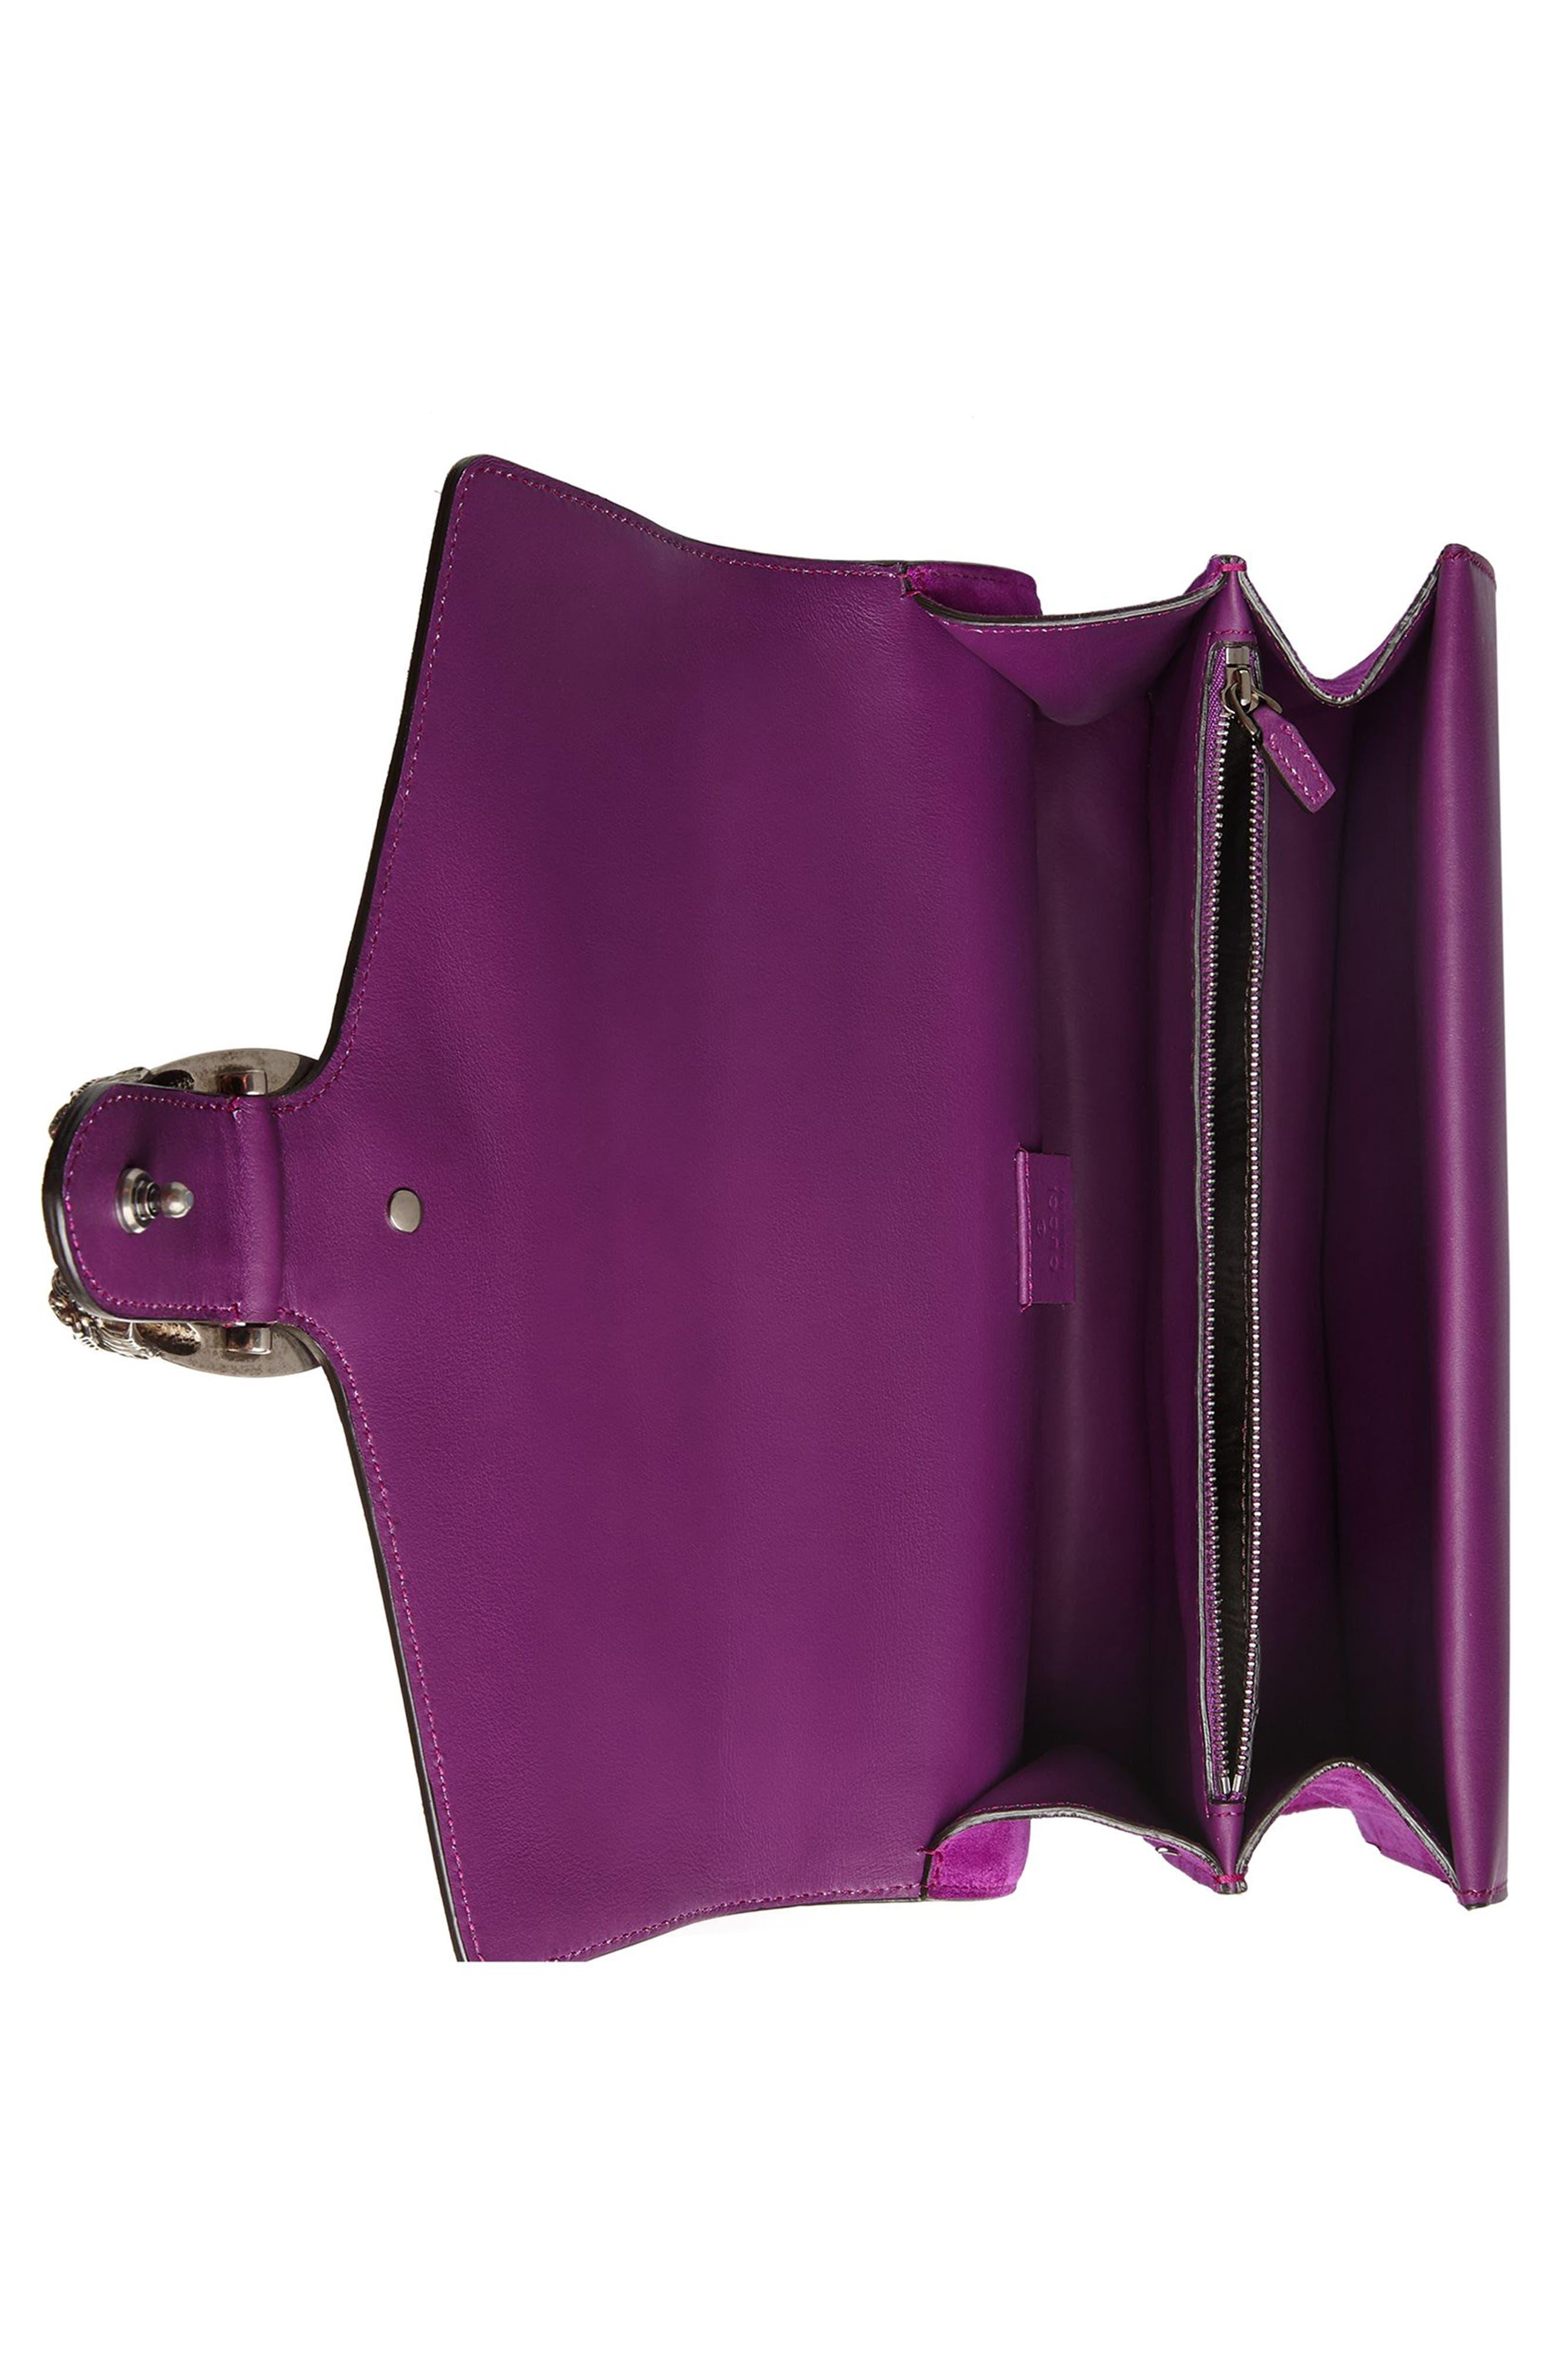 Dionysus Suede Shoulder Bag,                             Alternate thumbnail 3, color,                             PURPLE/MULTI